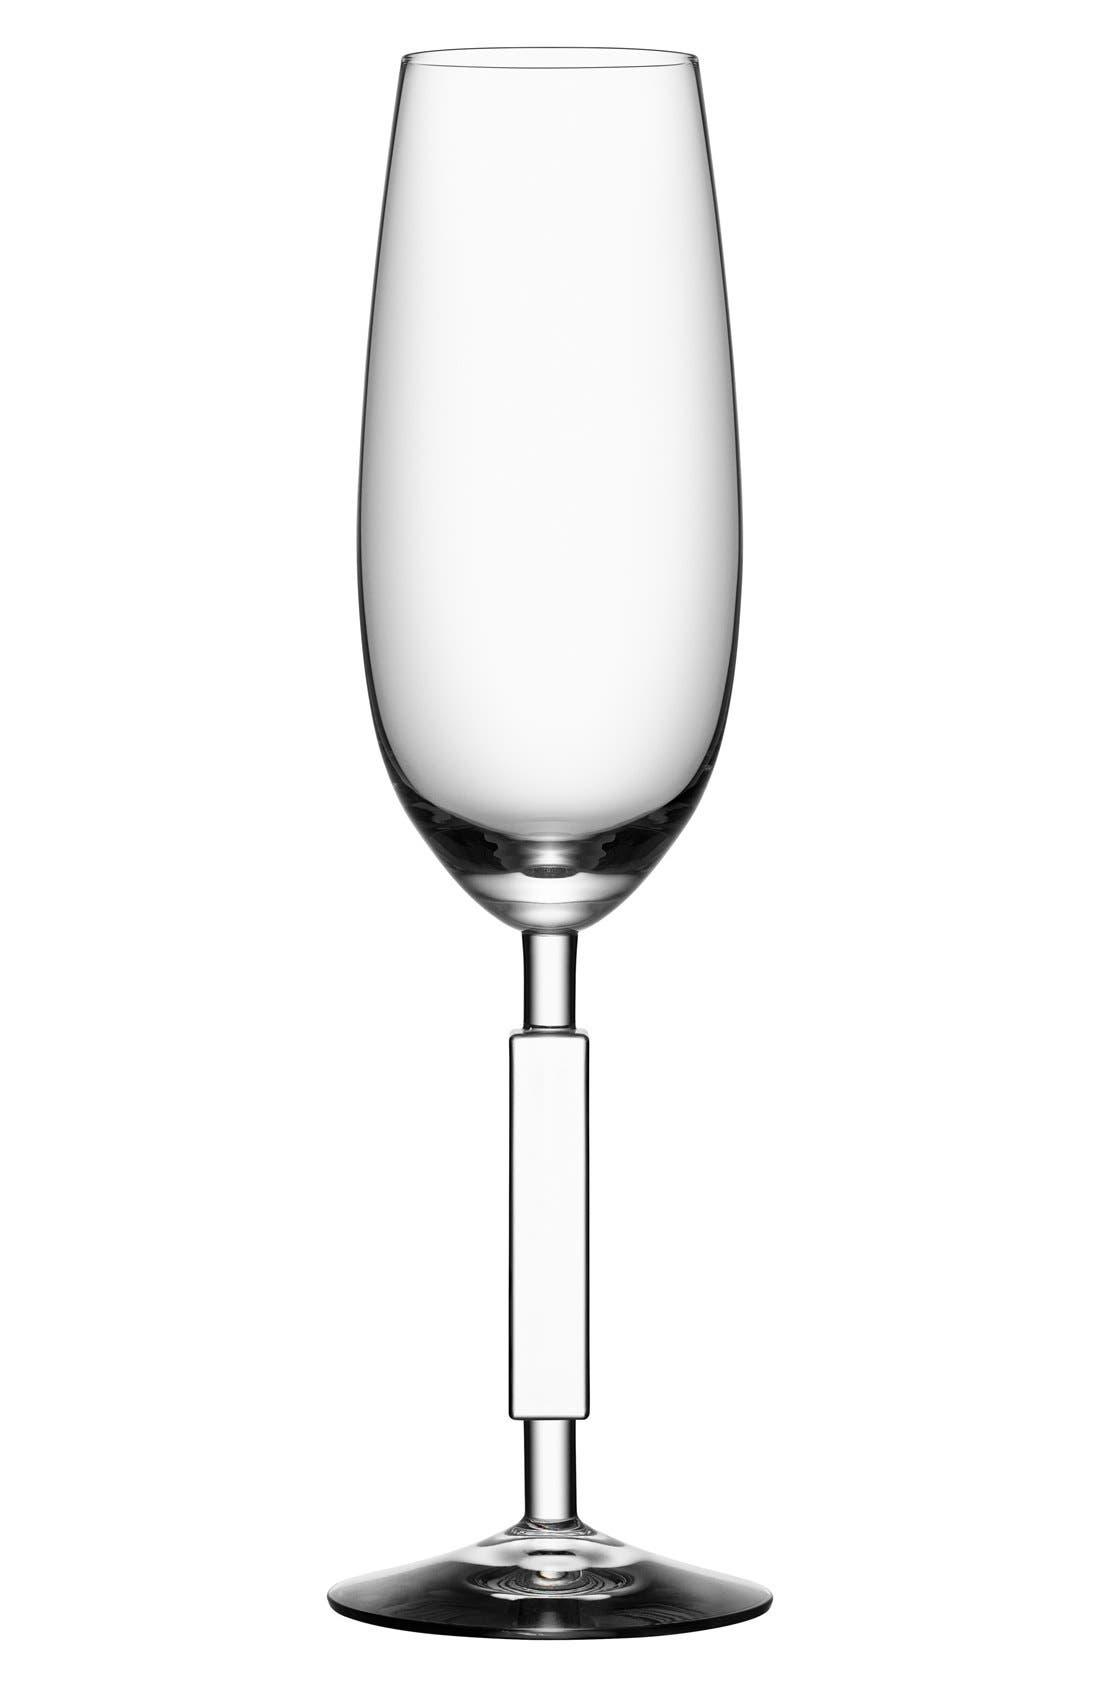 Main Image - Orrefors'Unique' ChampagneFlute